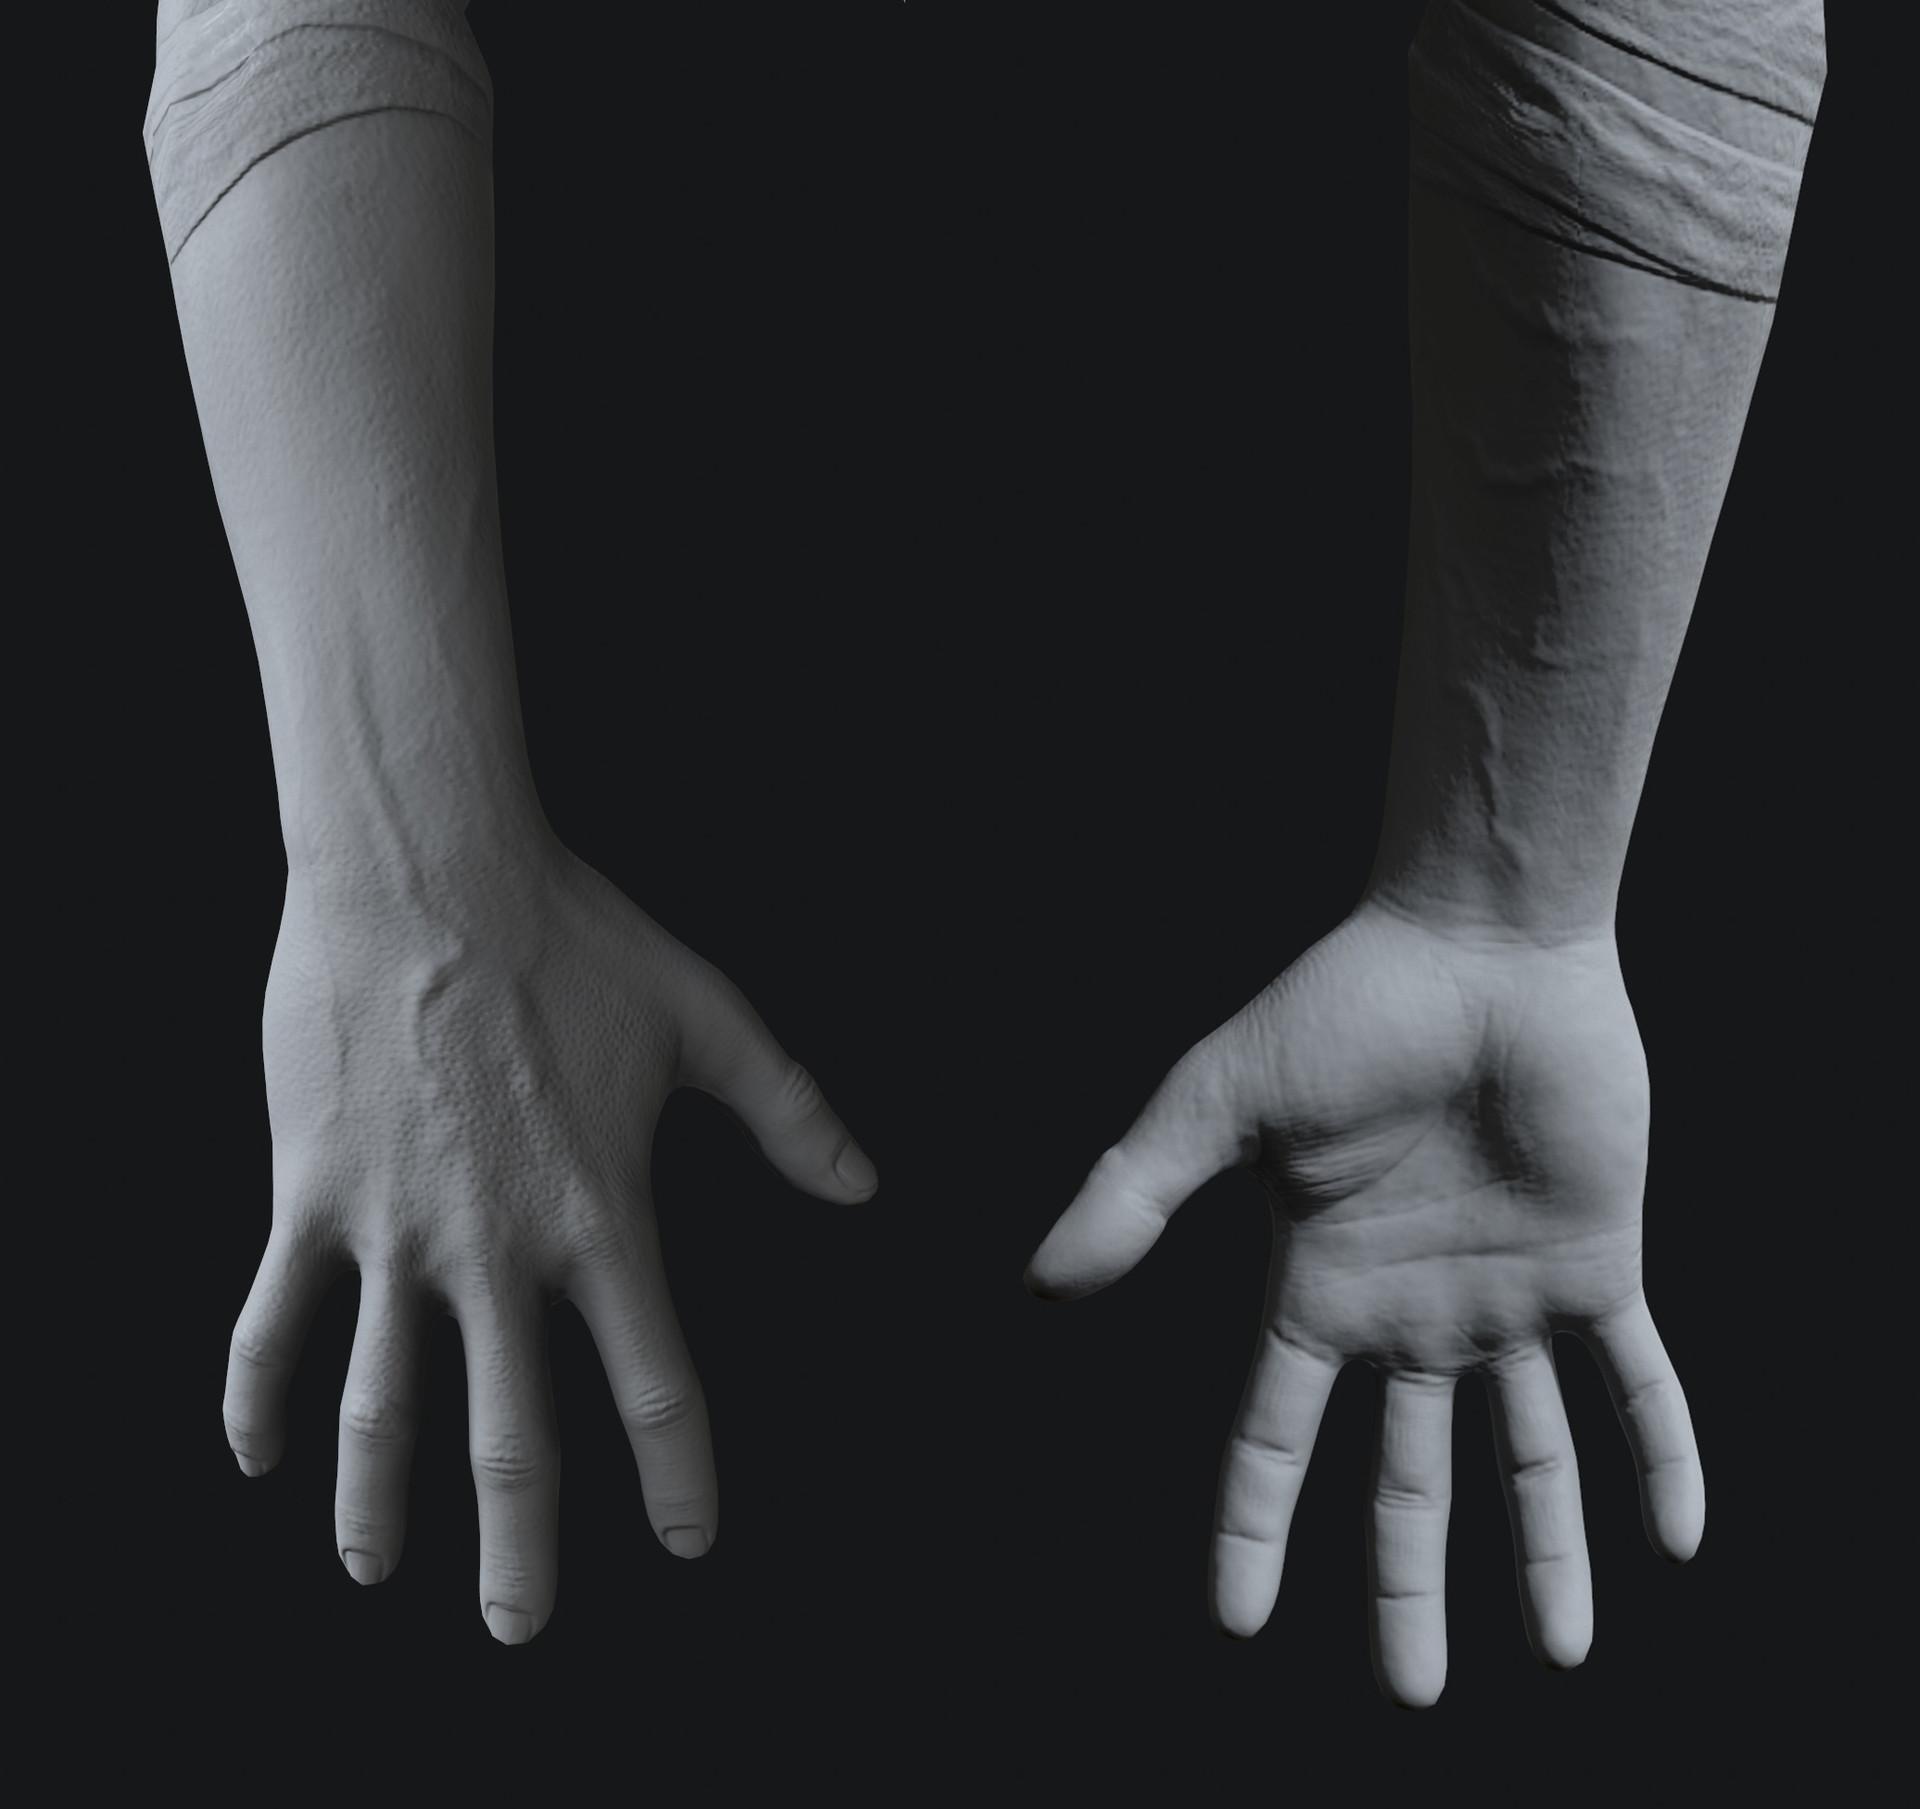 Pietro berto hands